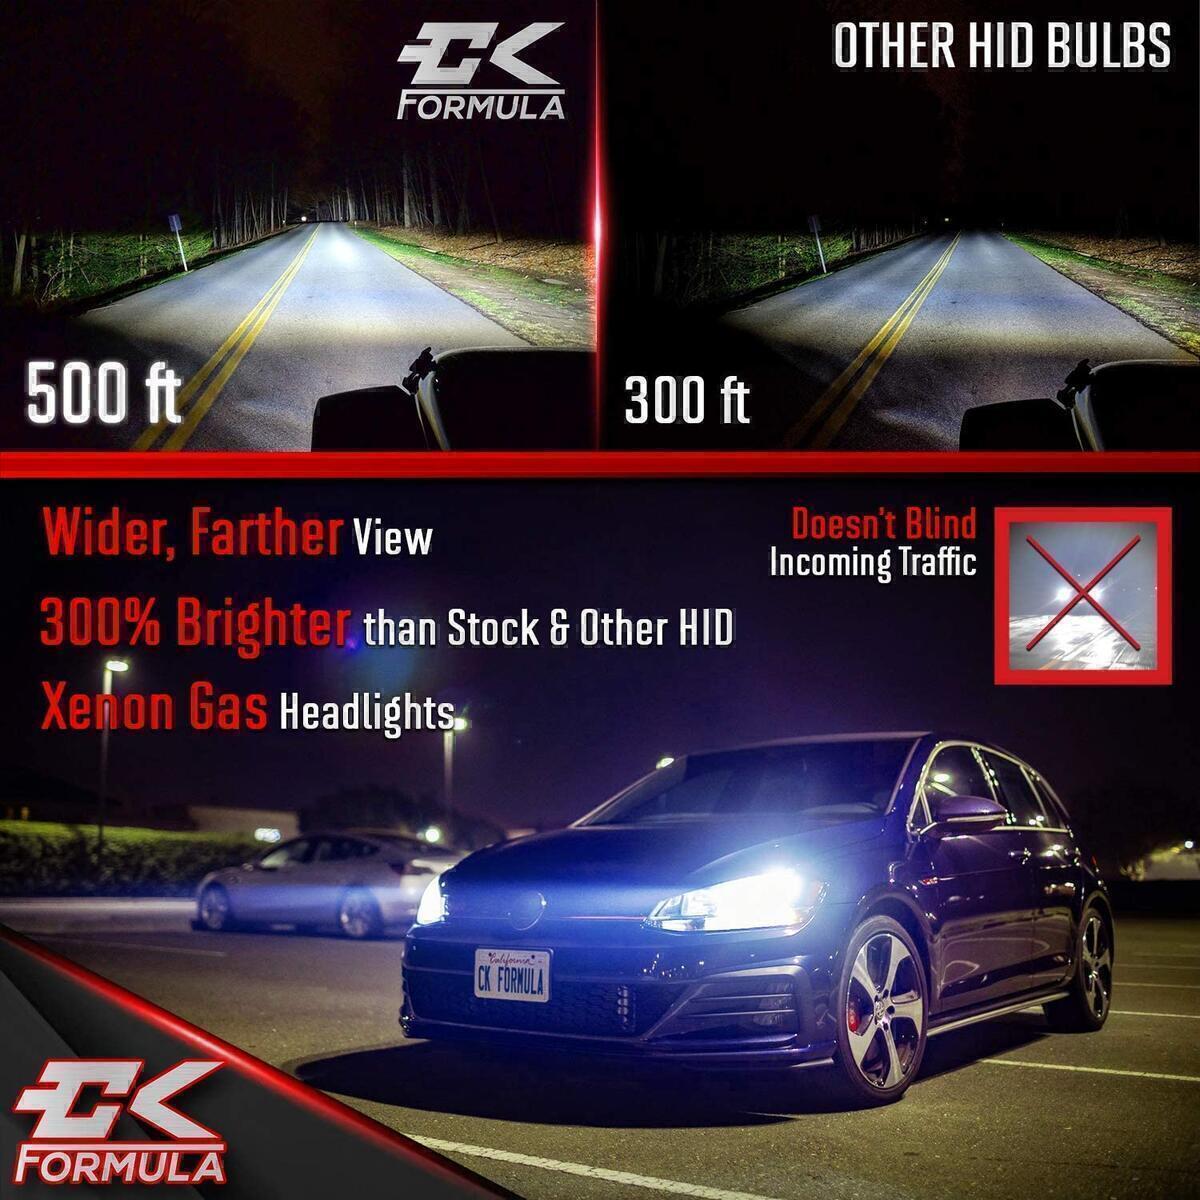 CK Formula D2C/D2R/D2S HID Headlight Bulb 10000K - Dark Blue, 12V 35W, Xenon for Direct Factory Automotive OEM Head Light Replacement IP68 Waterproof (Set of 2)